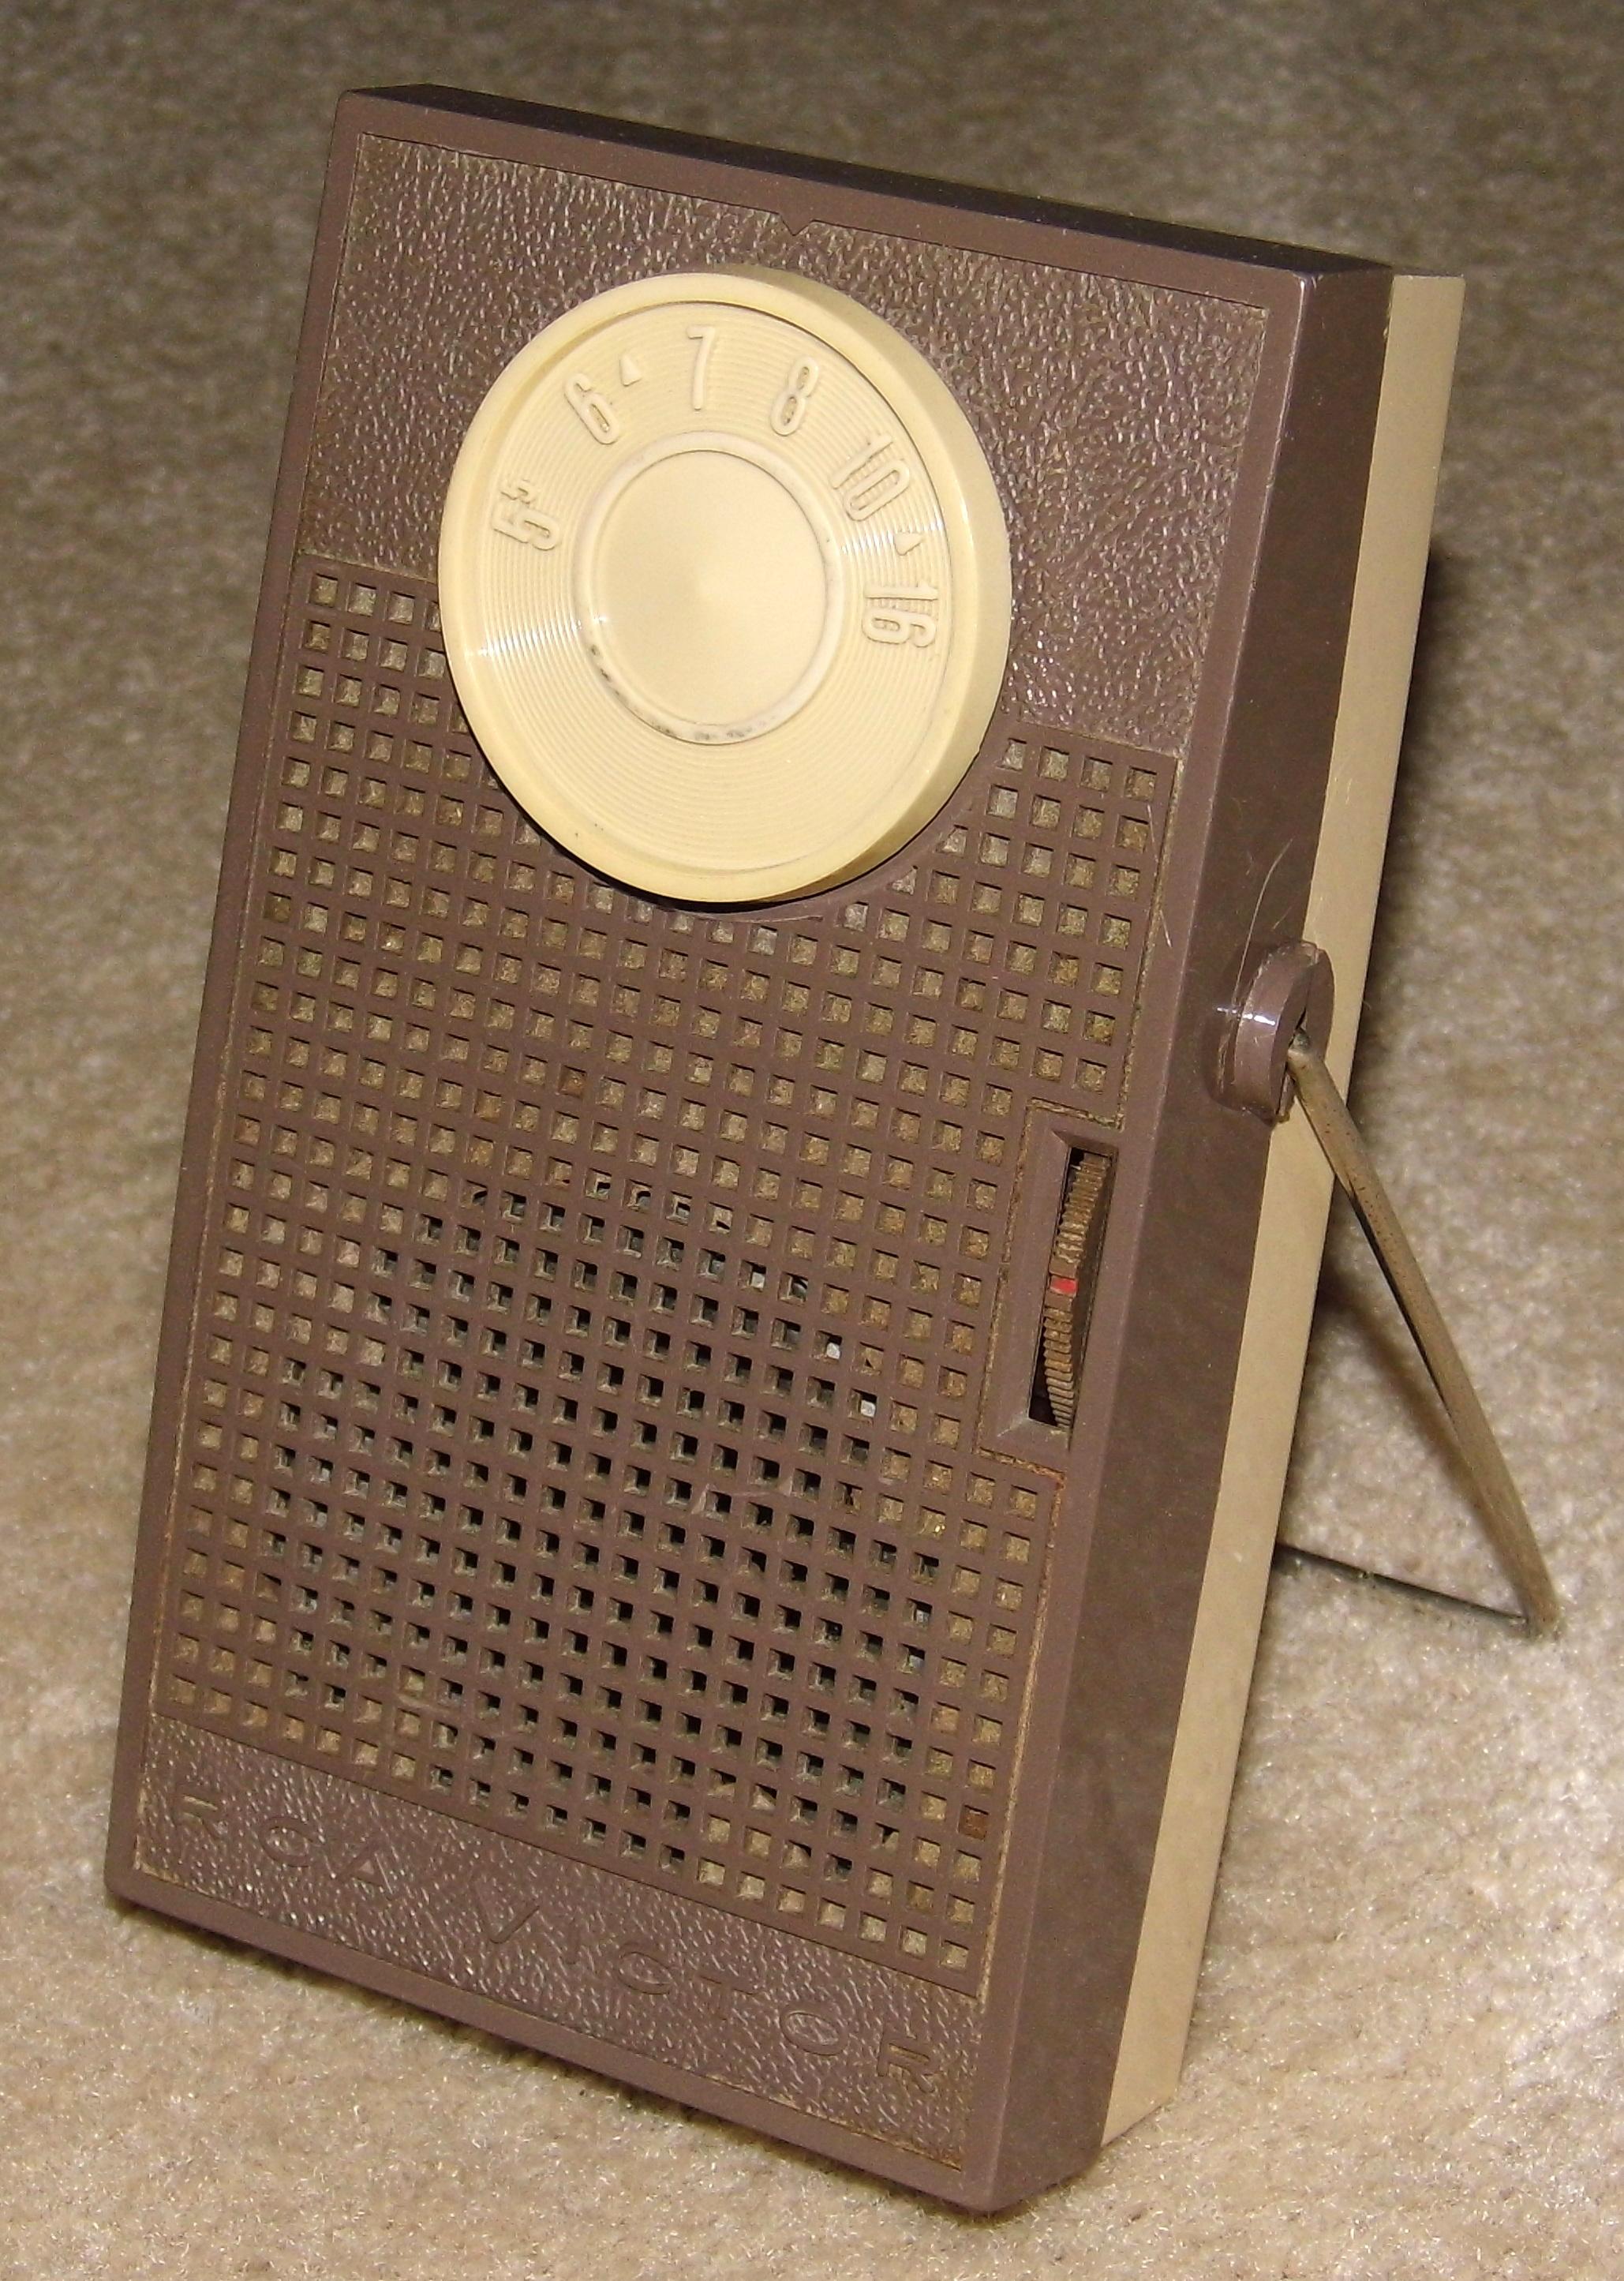 File:Vintage RCA Victor 6-Transistor Radio, Model 3-RG-14